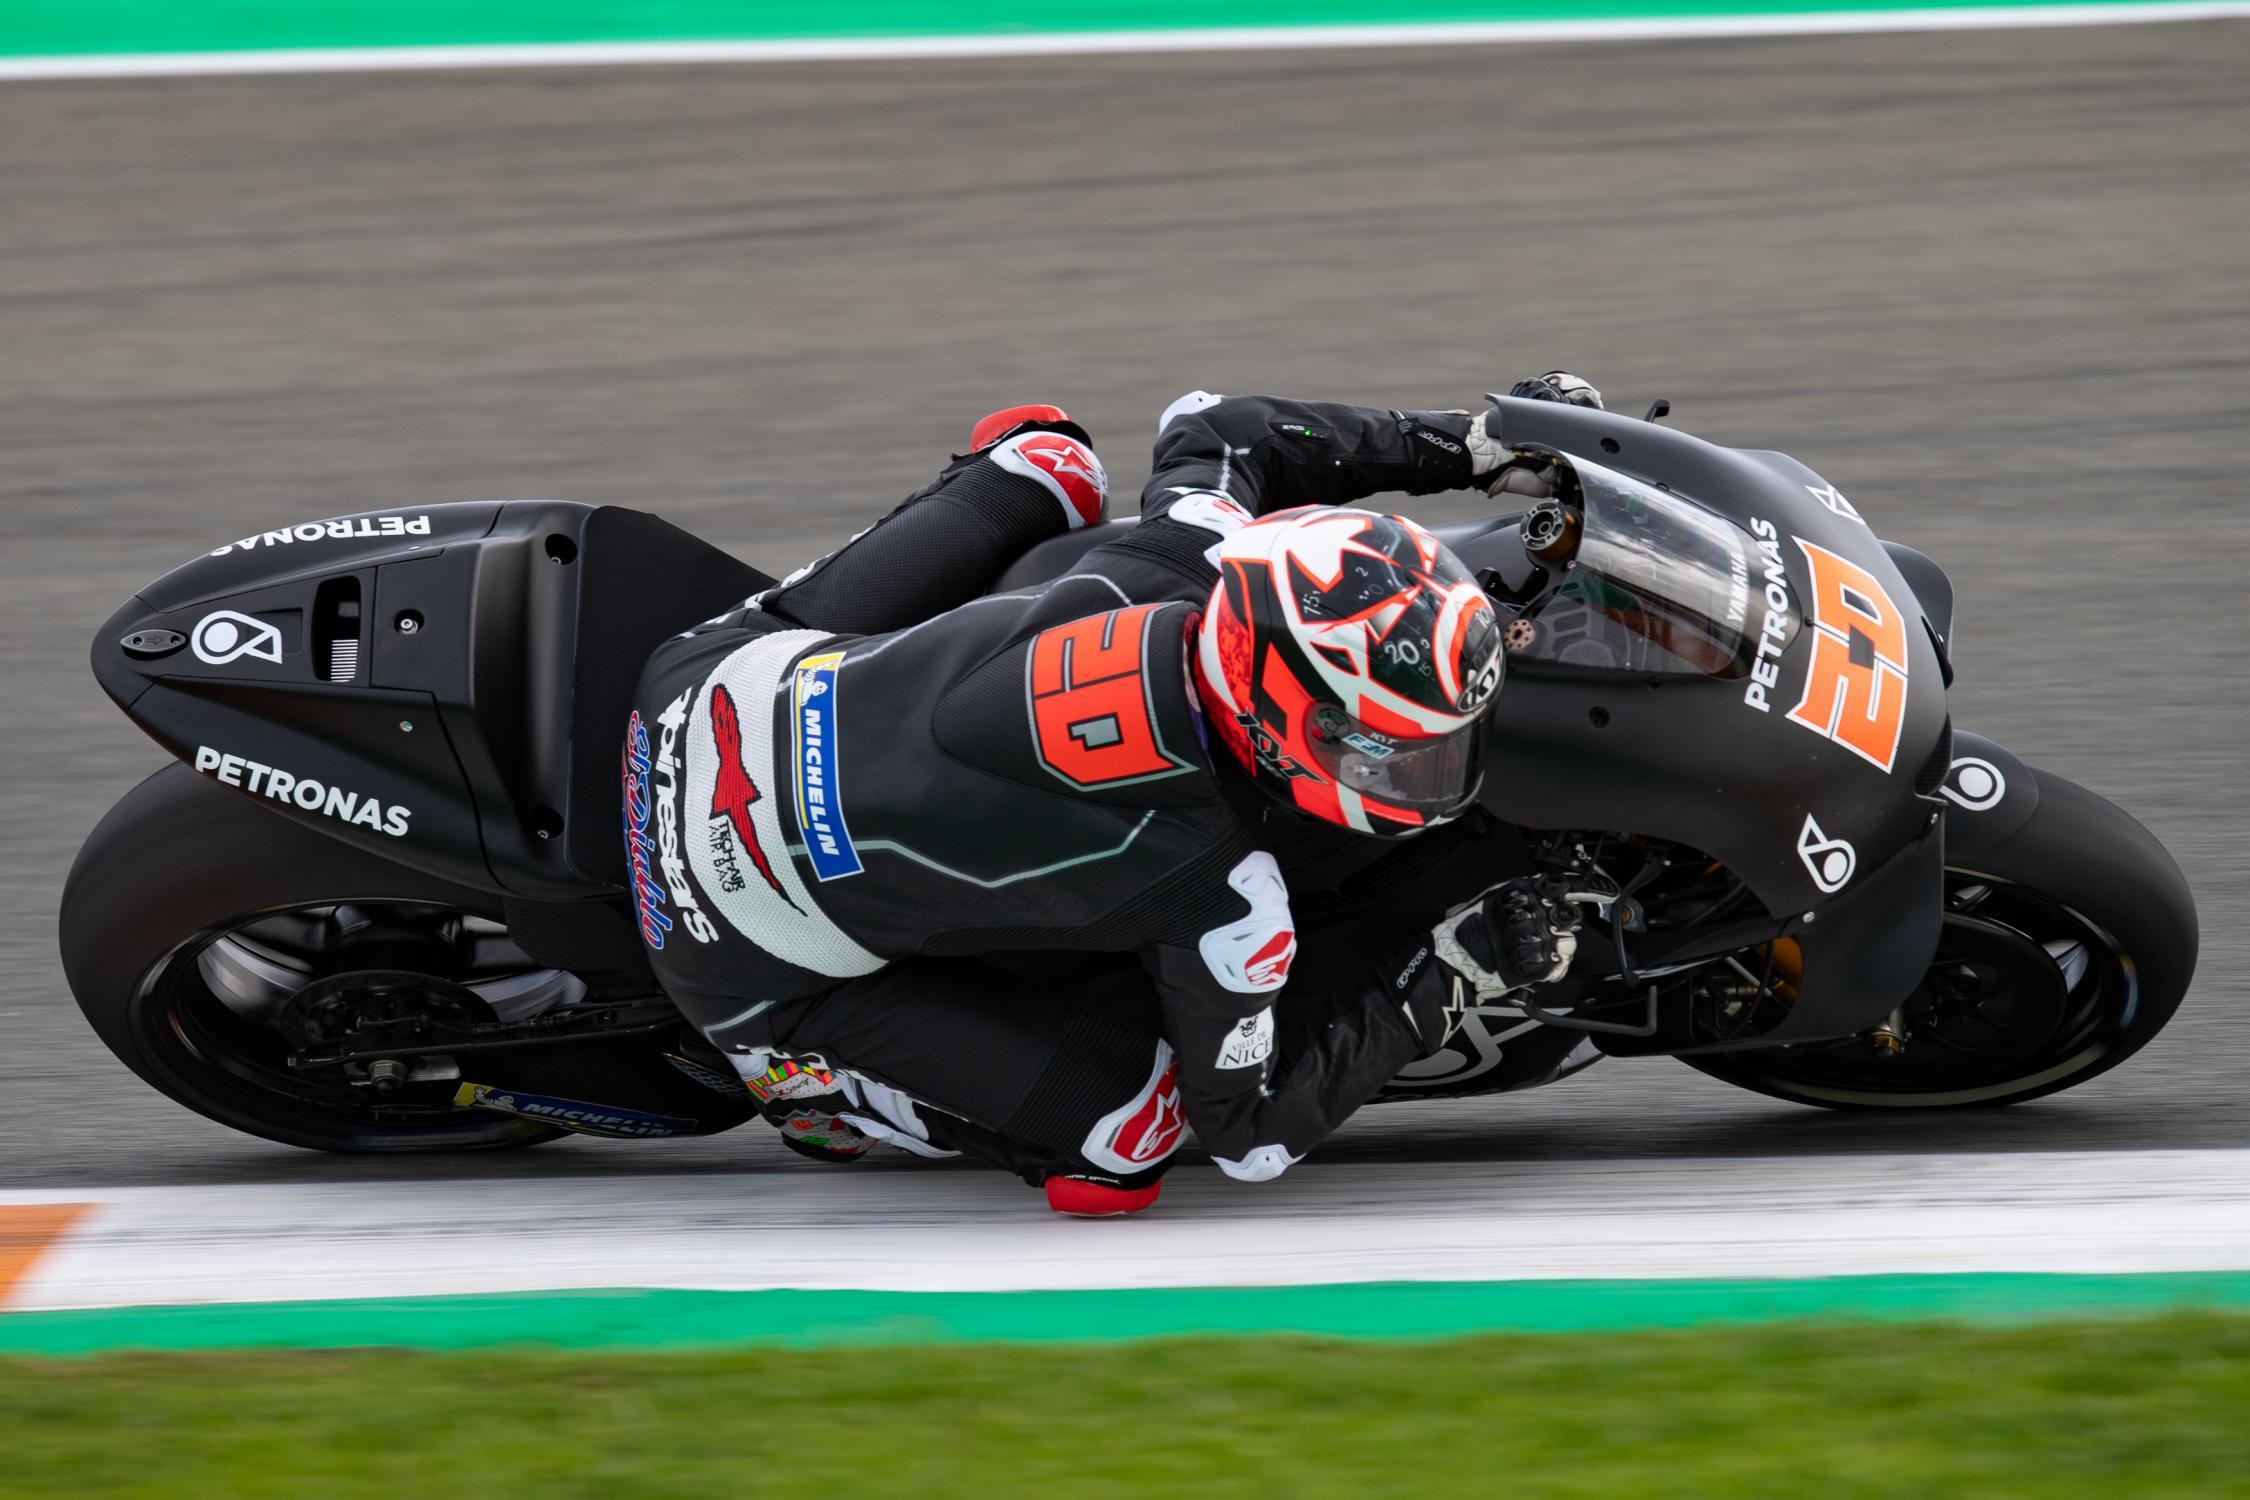 MOTO GP 2019 COMPÉTITIONS Fabio-quartararo-valencia-test-j2-motogp-2018